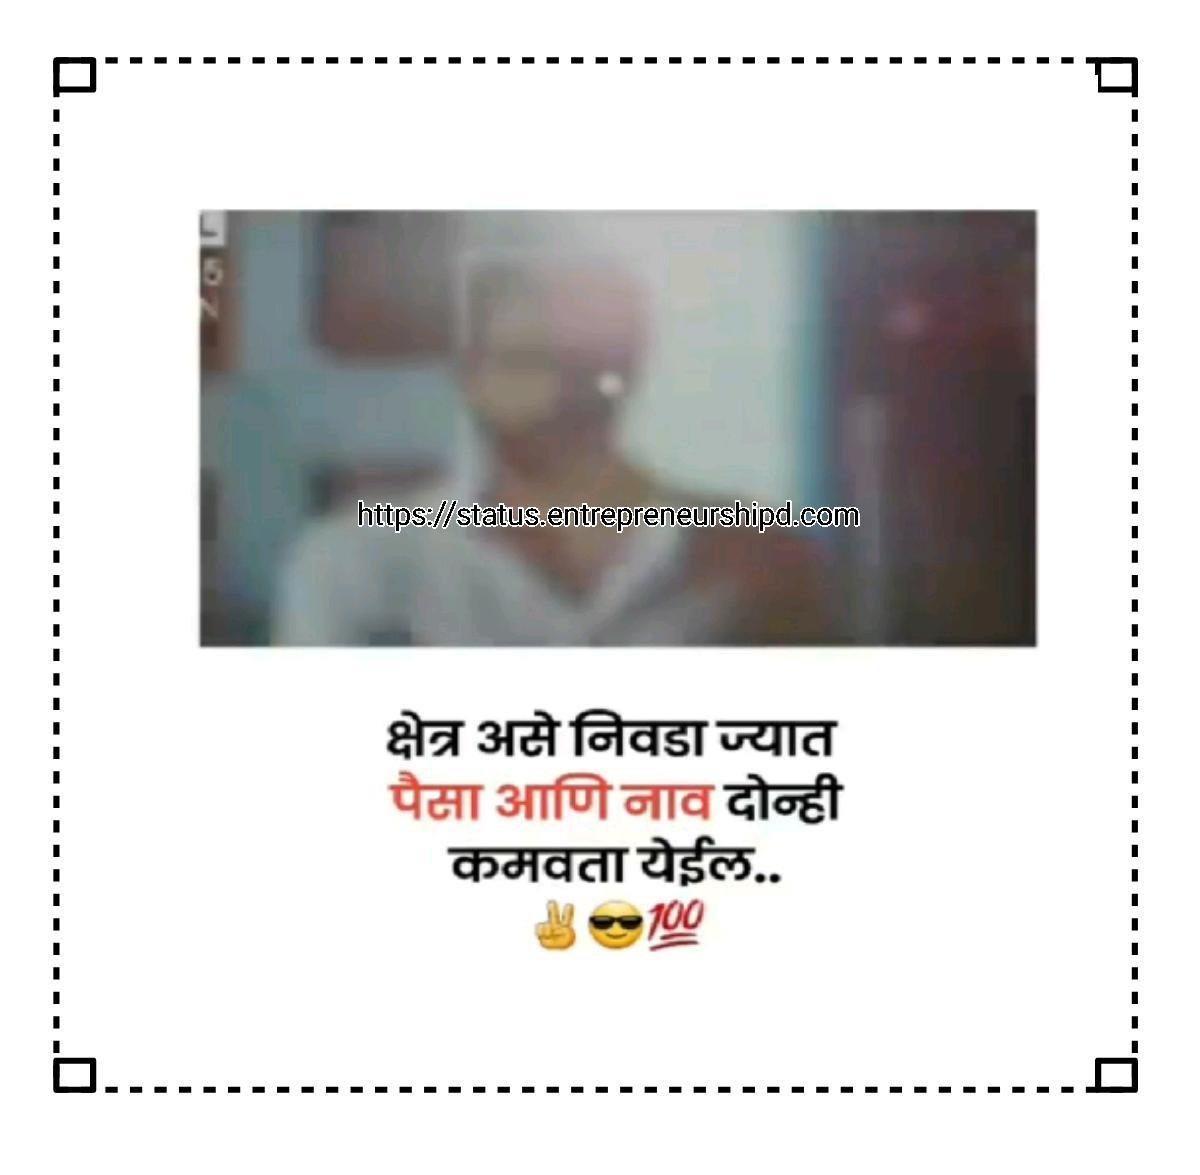 Marathi attitude status caption